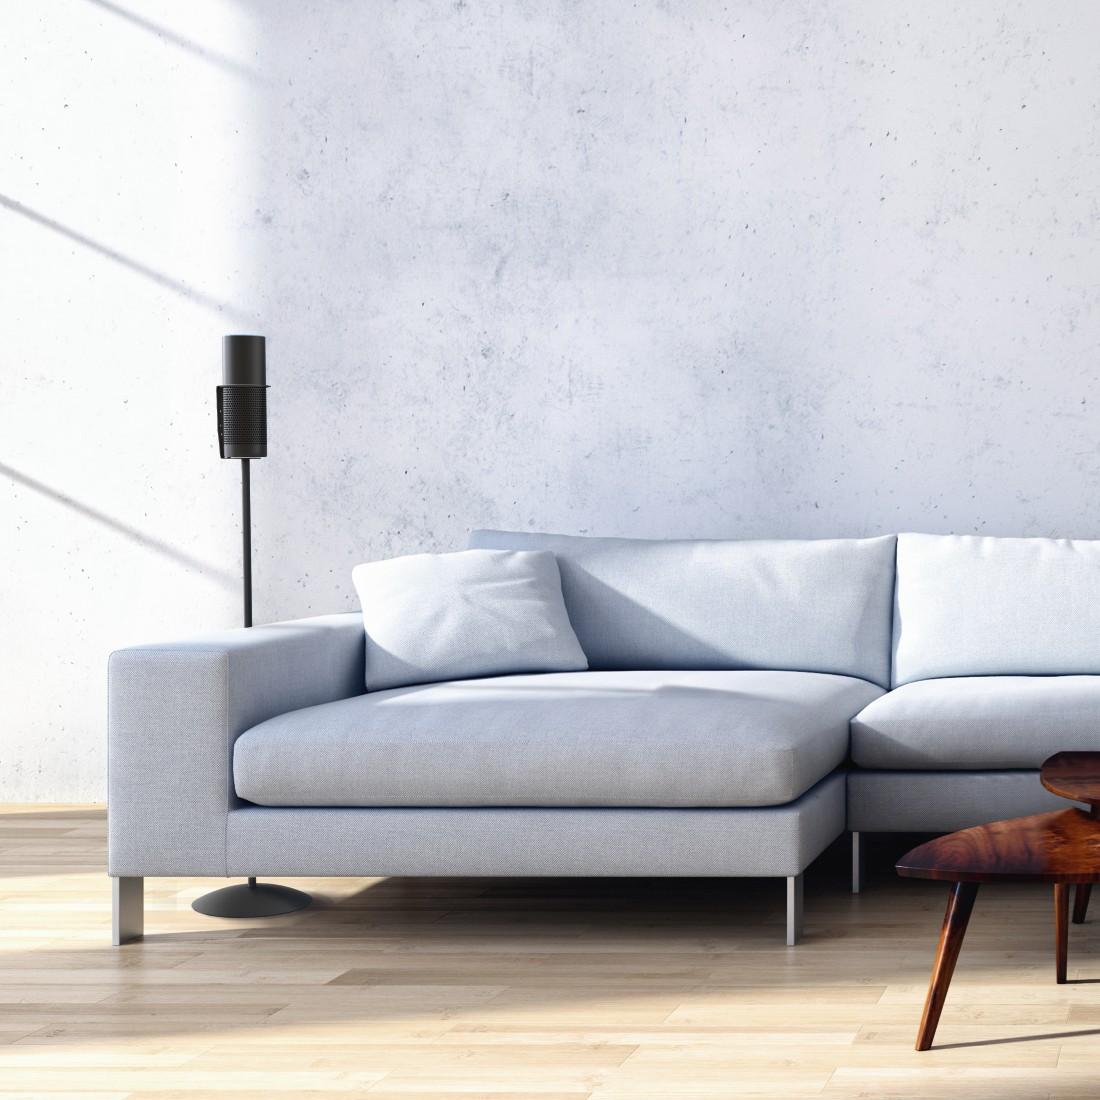 00181524 hama lautsprecherst nder f r amazon echo 1. Black Bedroom Furniture Sets. Home Design Ideas